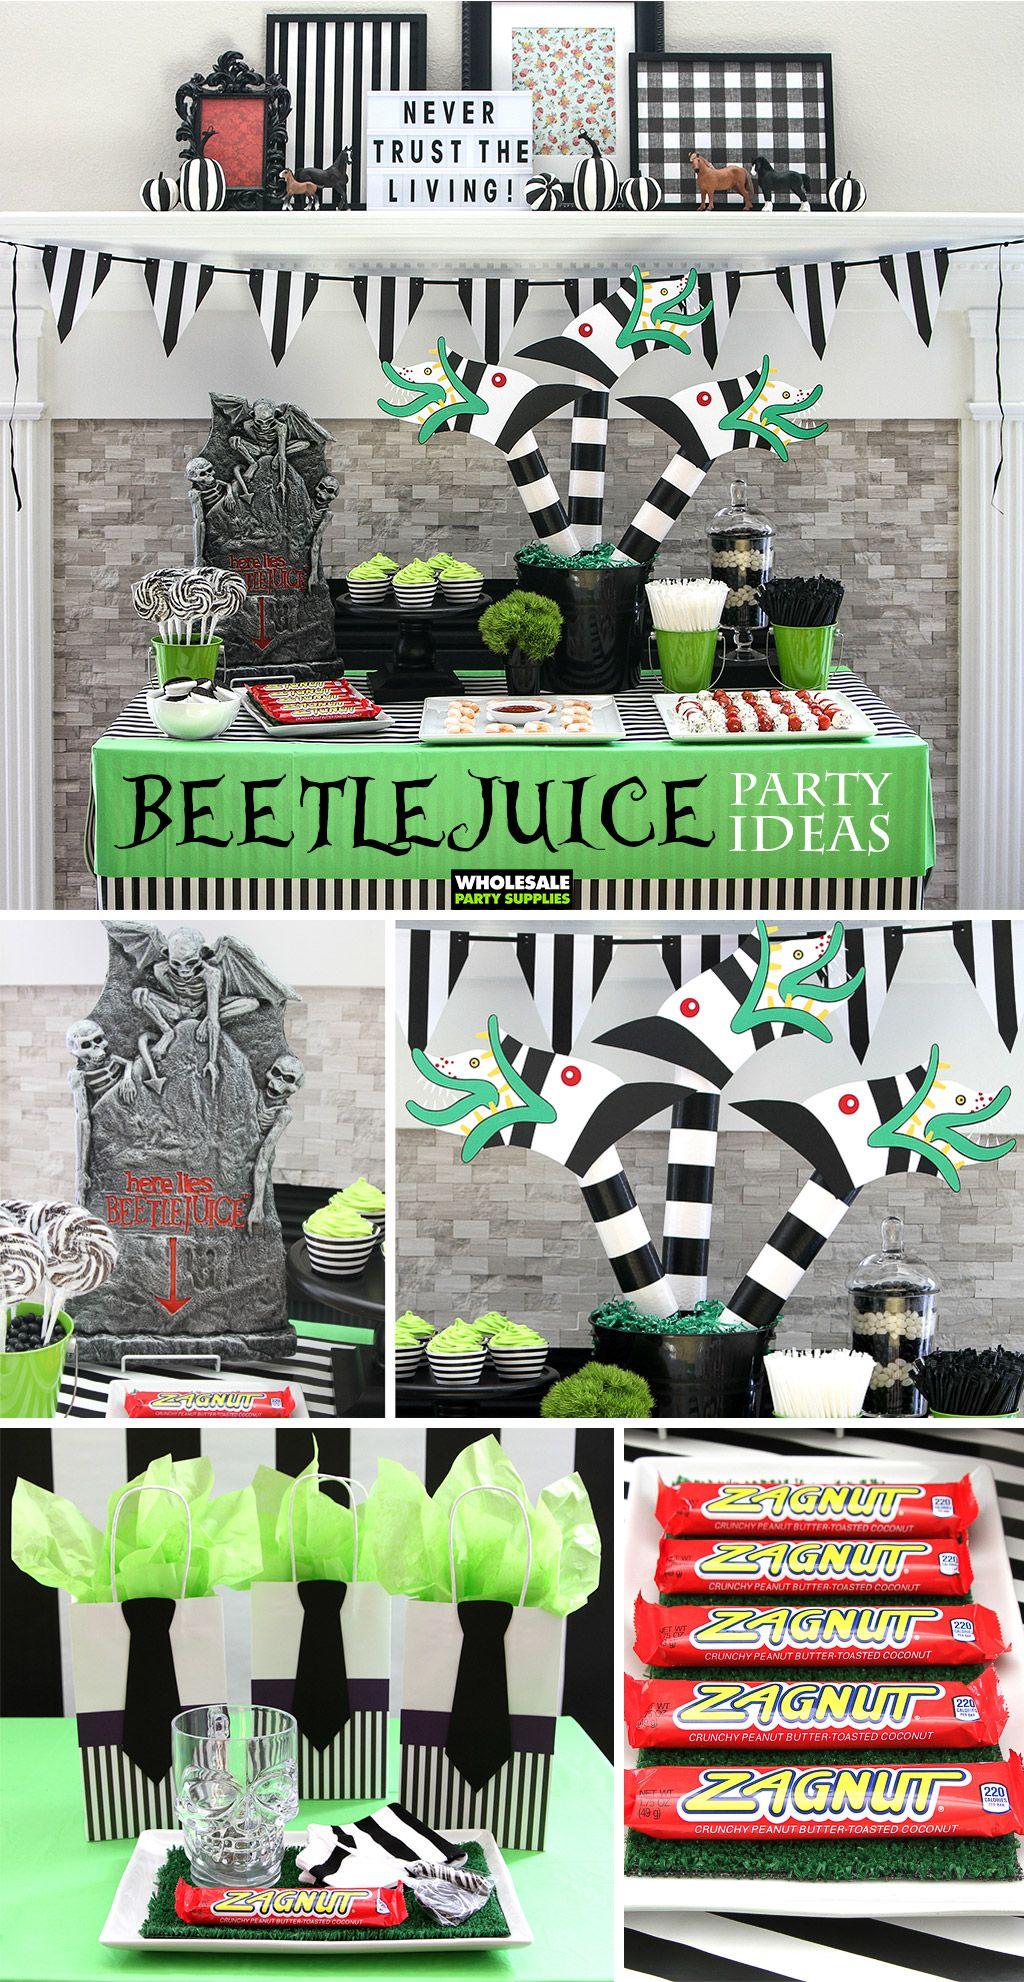 Beetlejuice Party Ideas